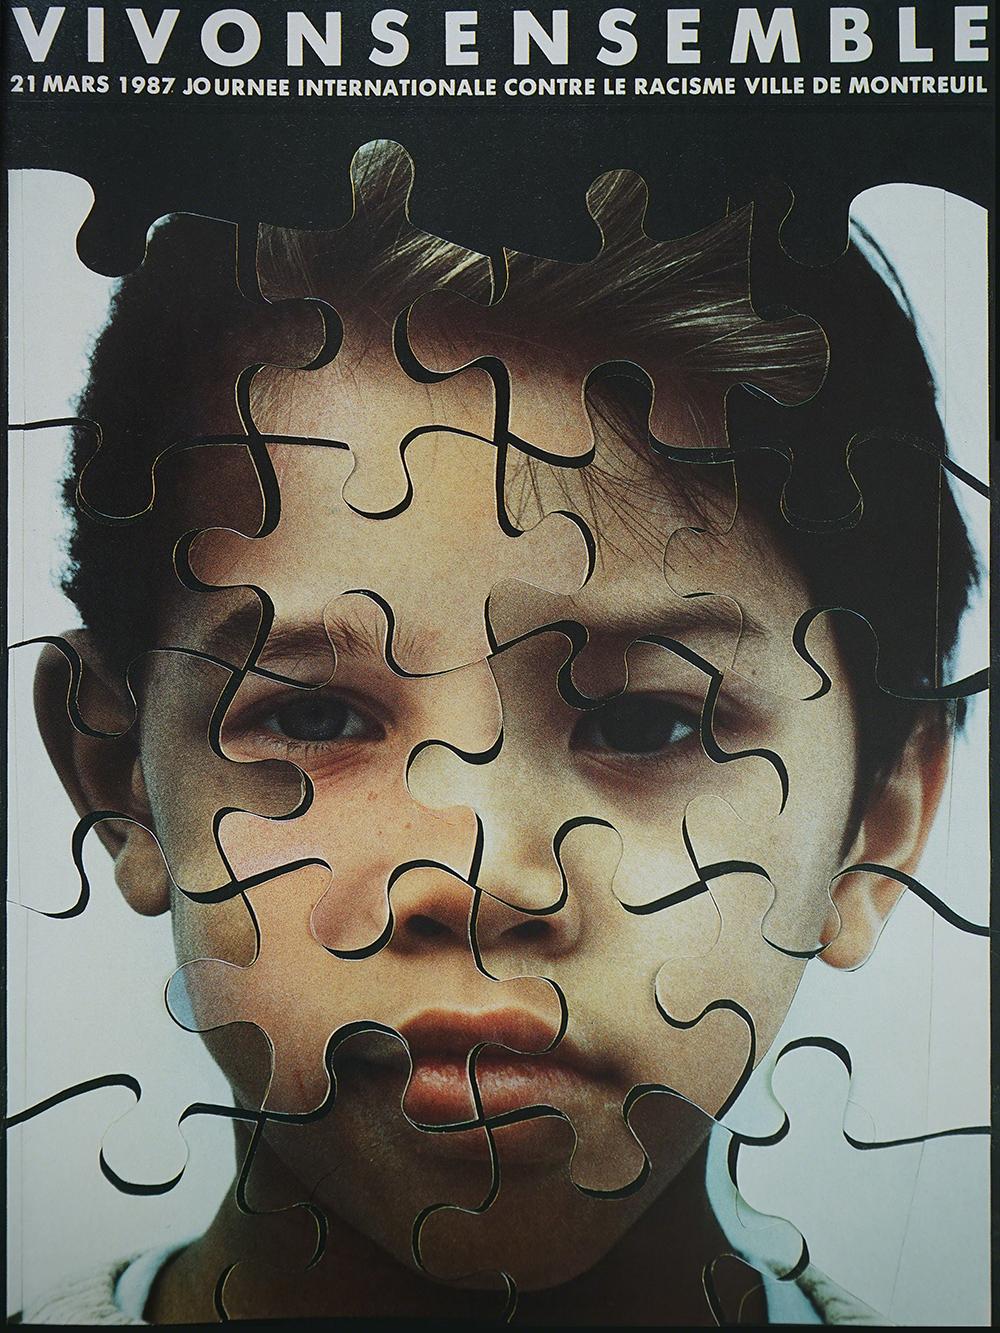 vivons-ensemble-c-baillargeon-web-1993.jpg